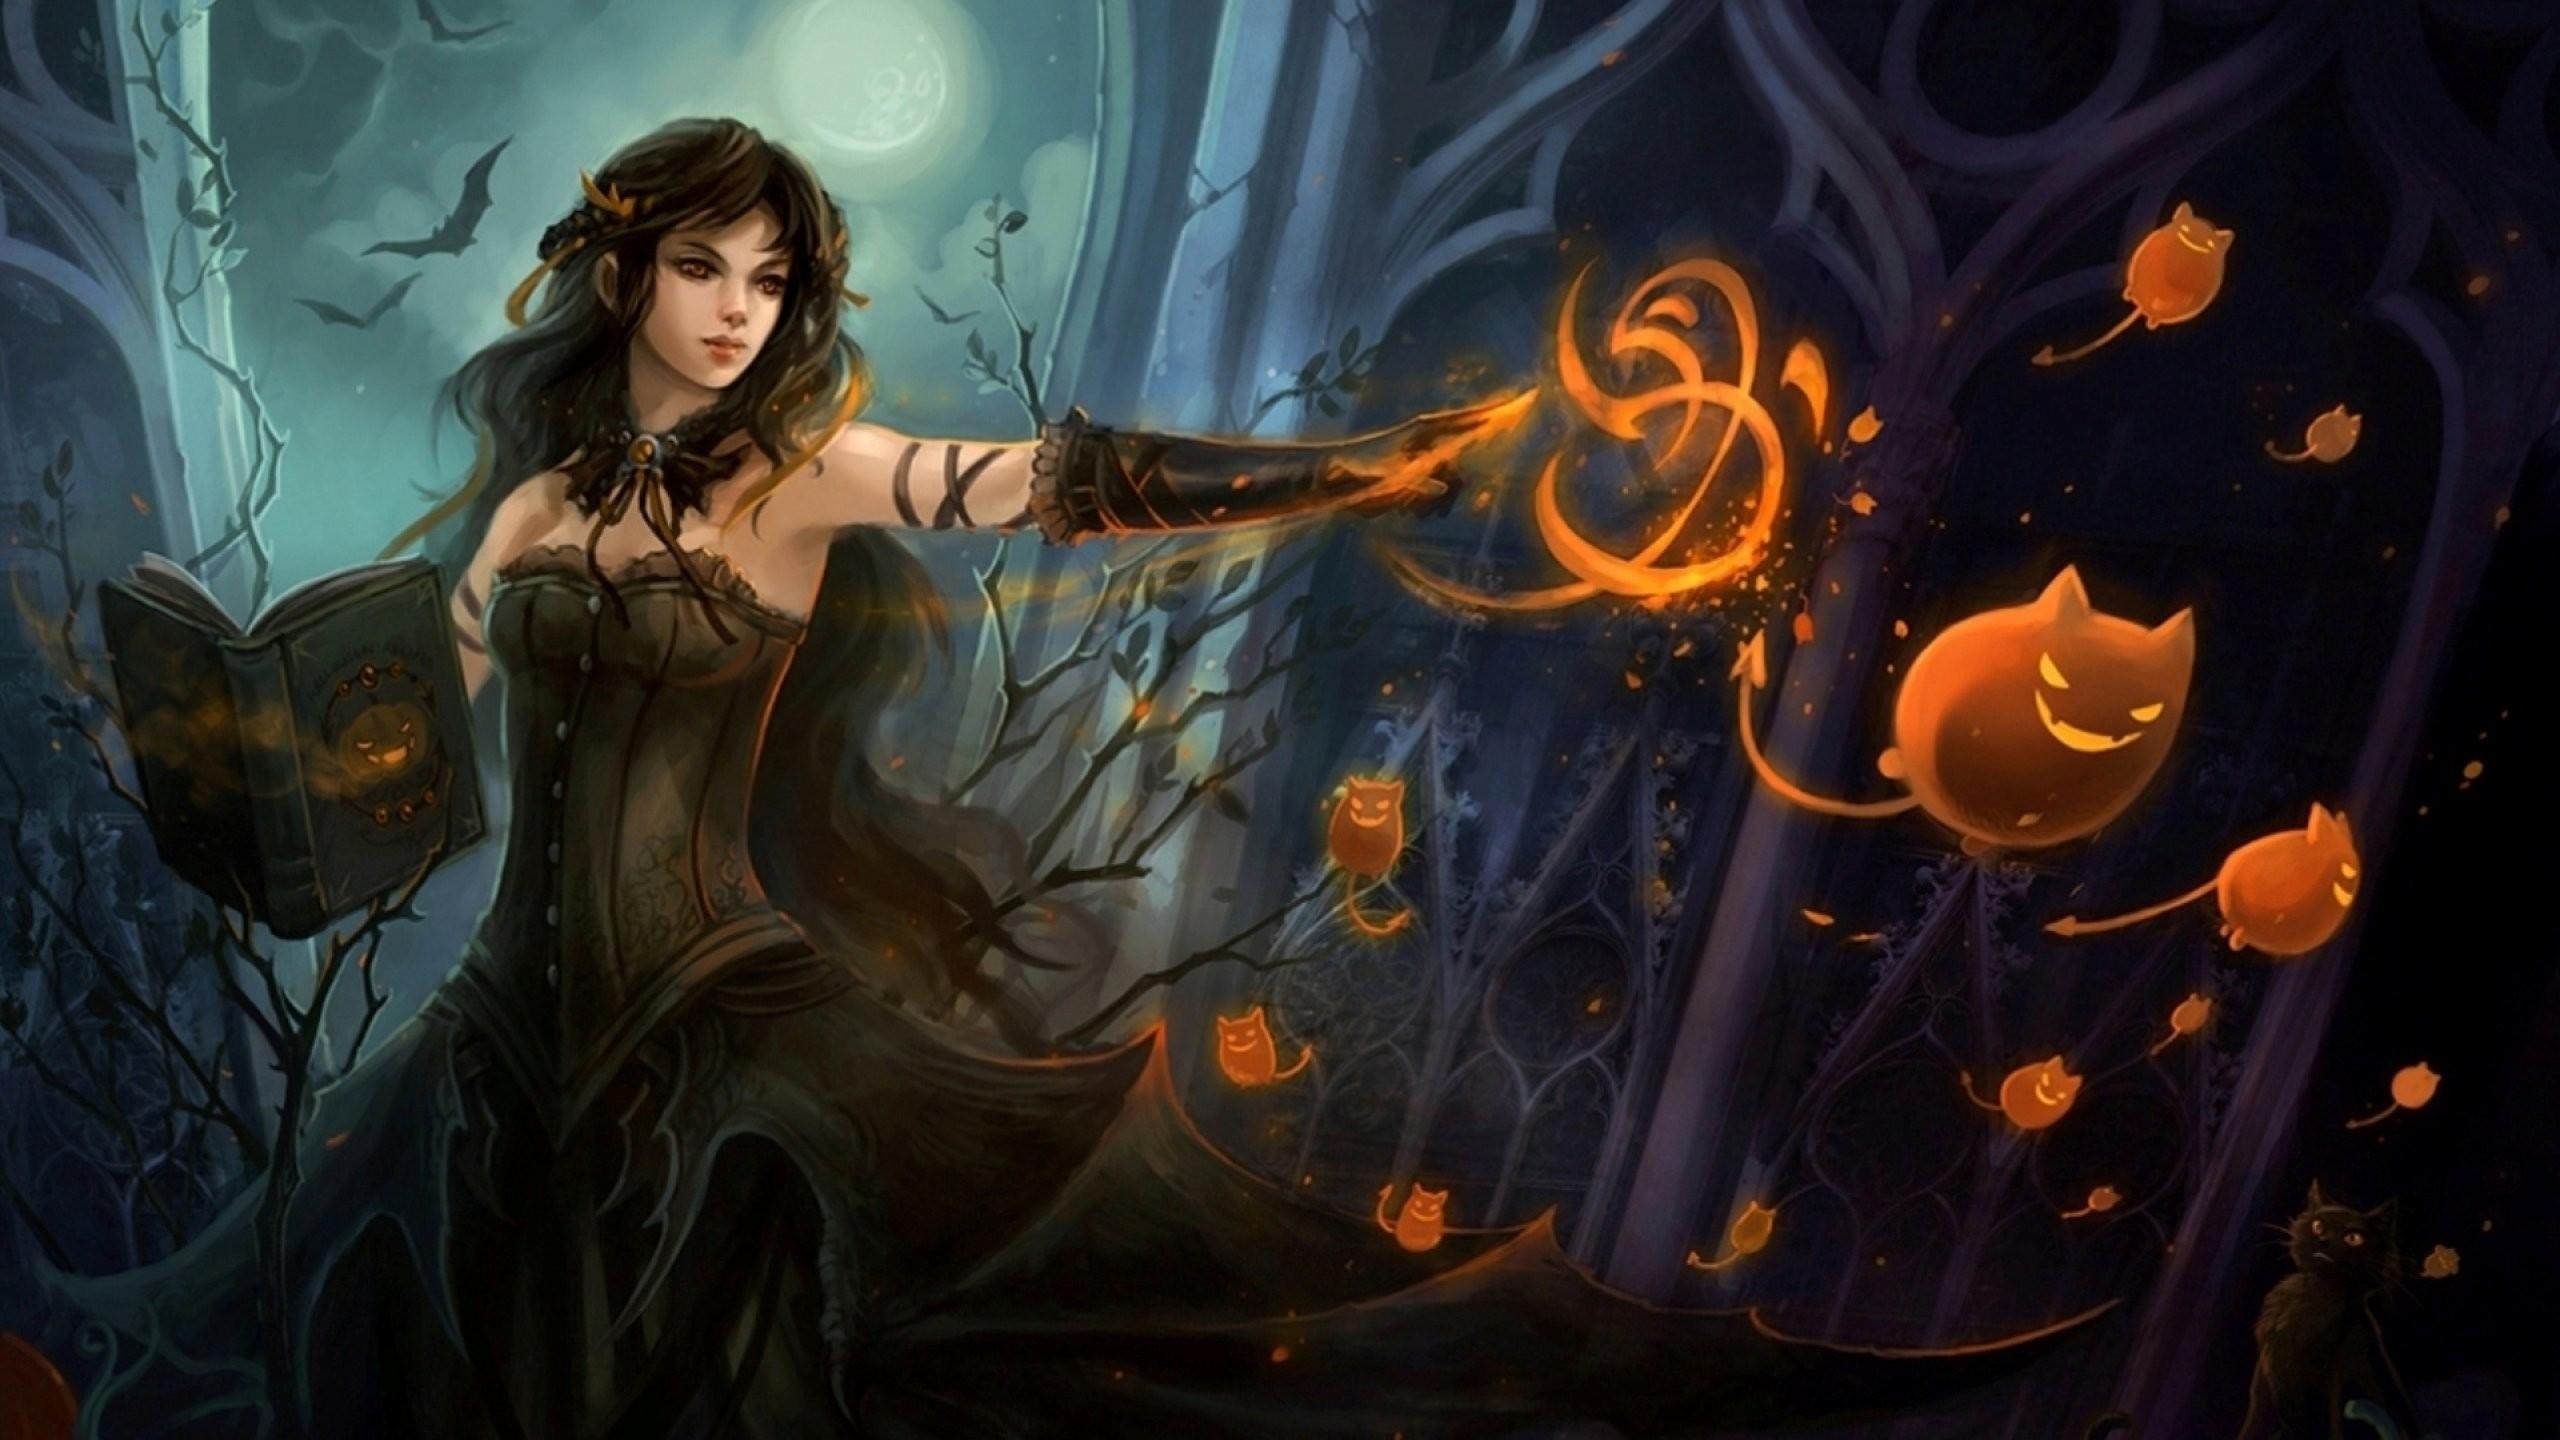 Fire Mage Female Fantasy Art